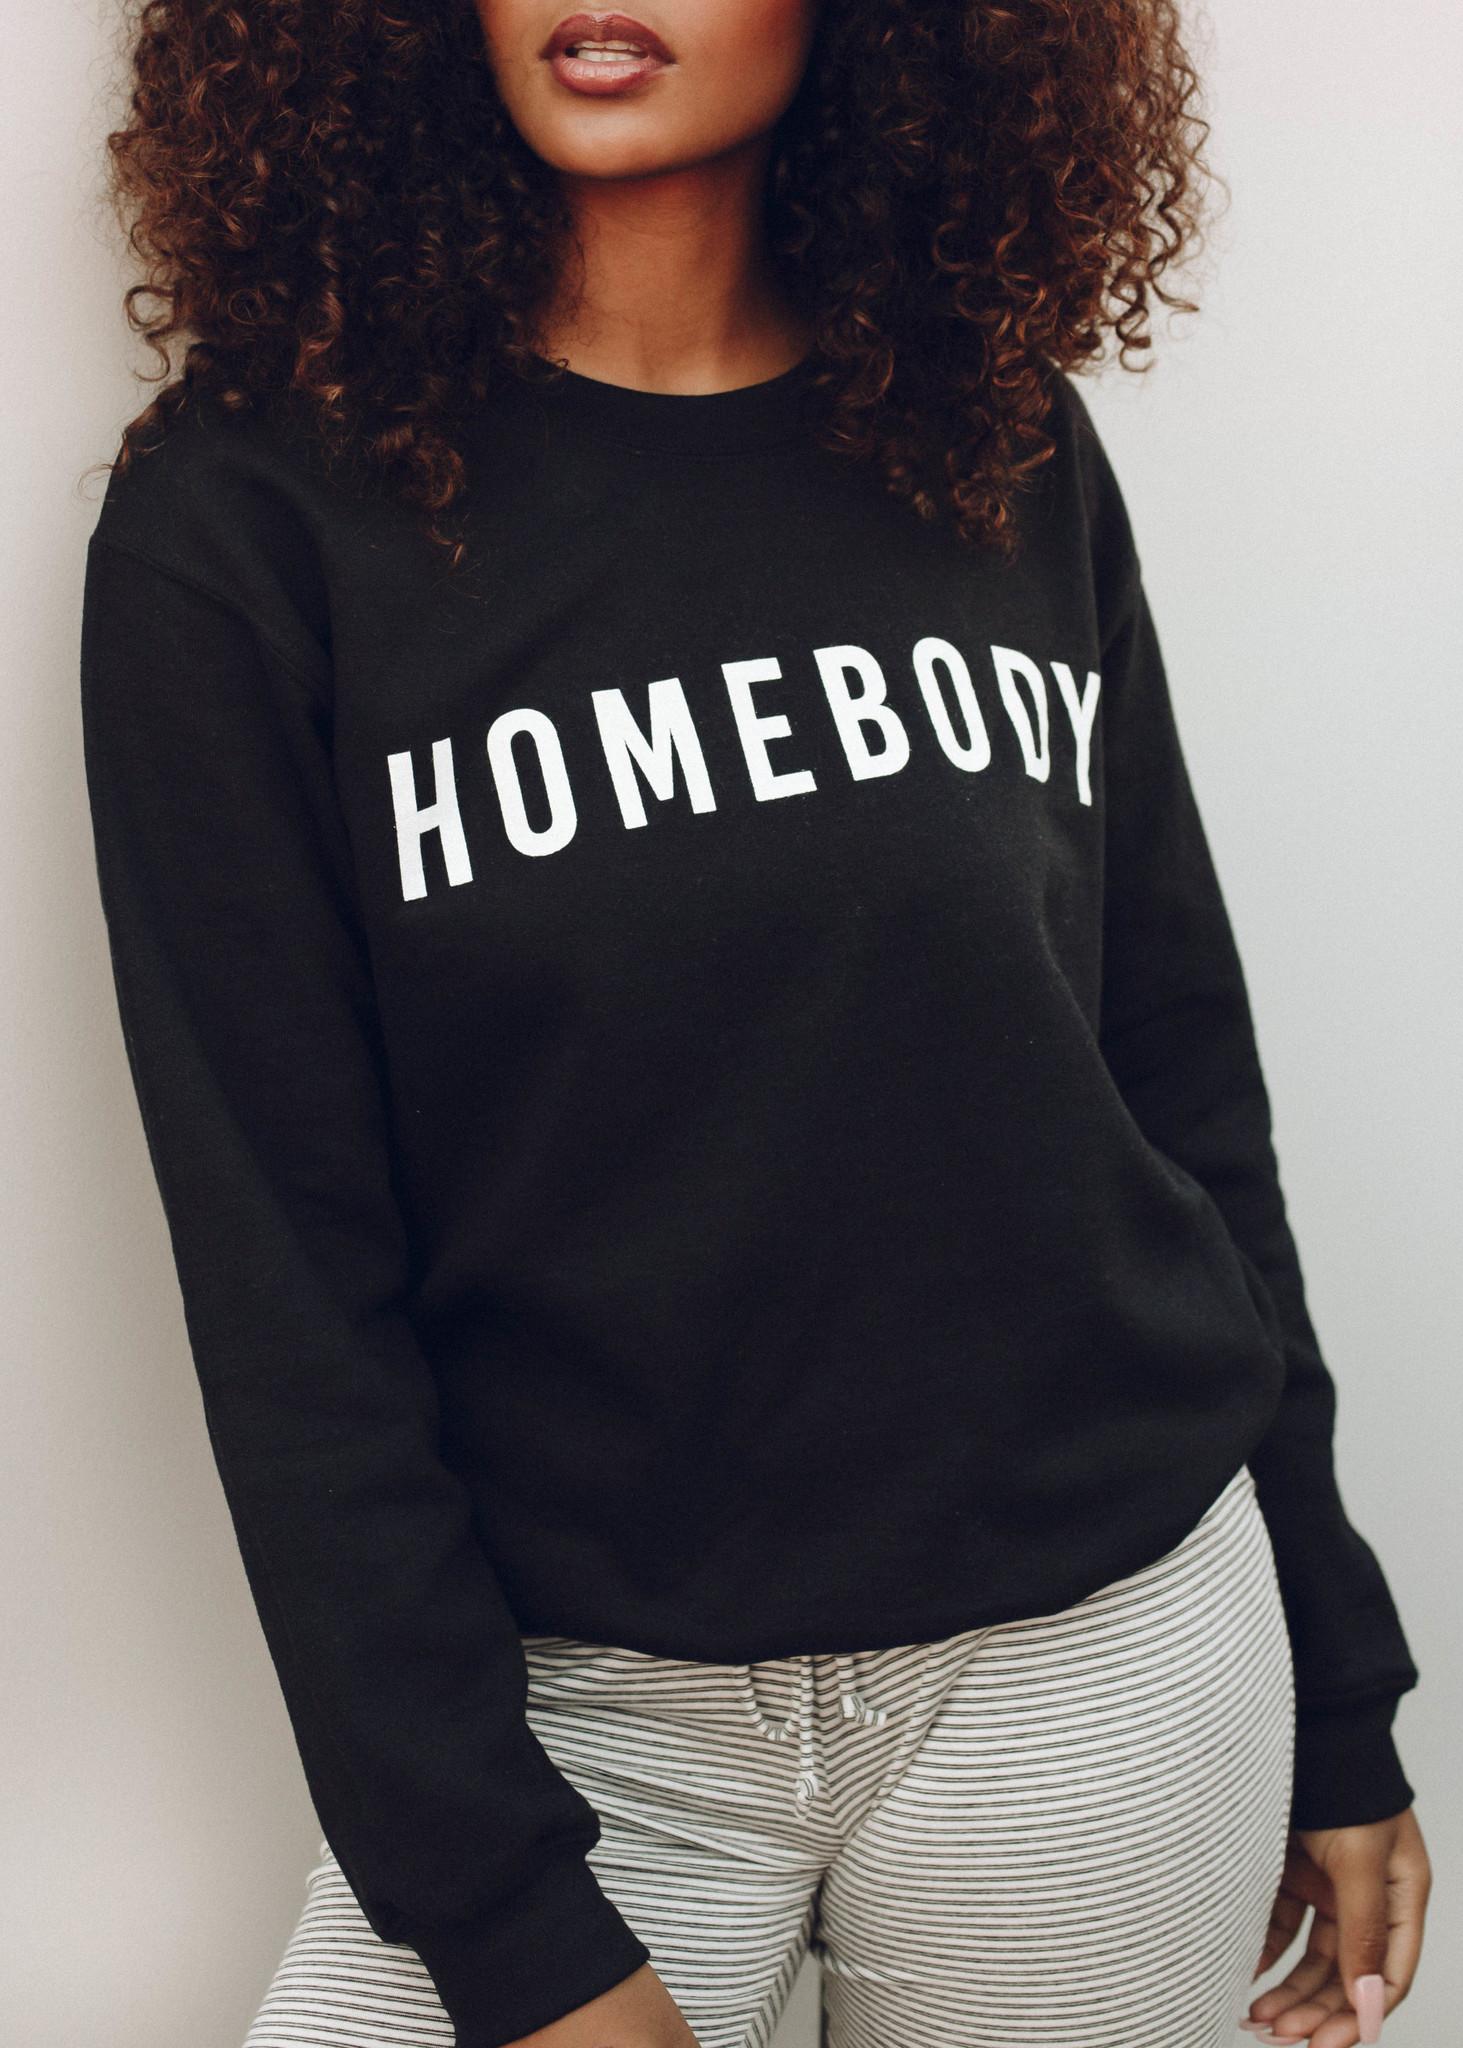 HOMEBODY SWEATSHIRT - BLACK